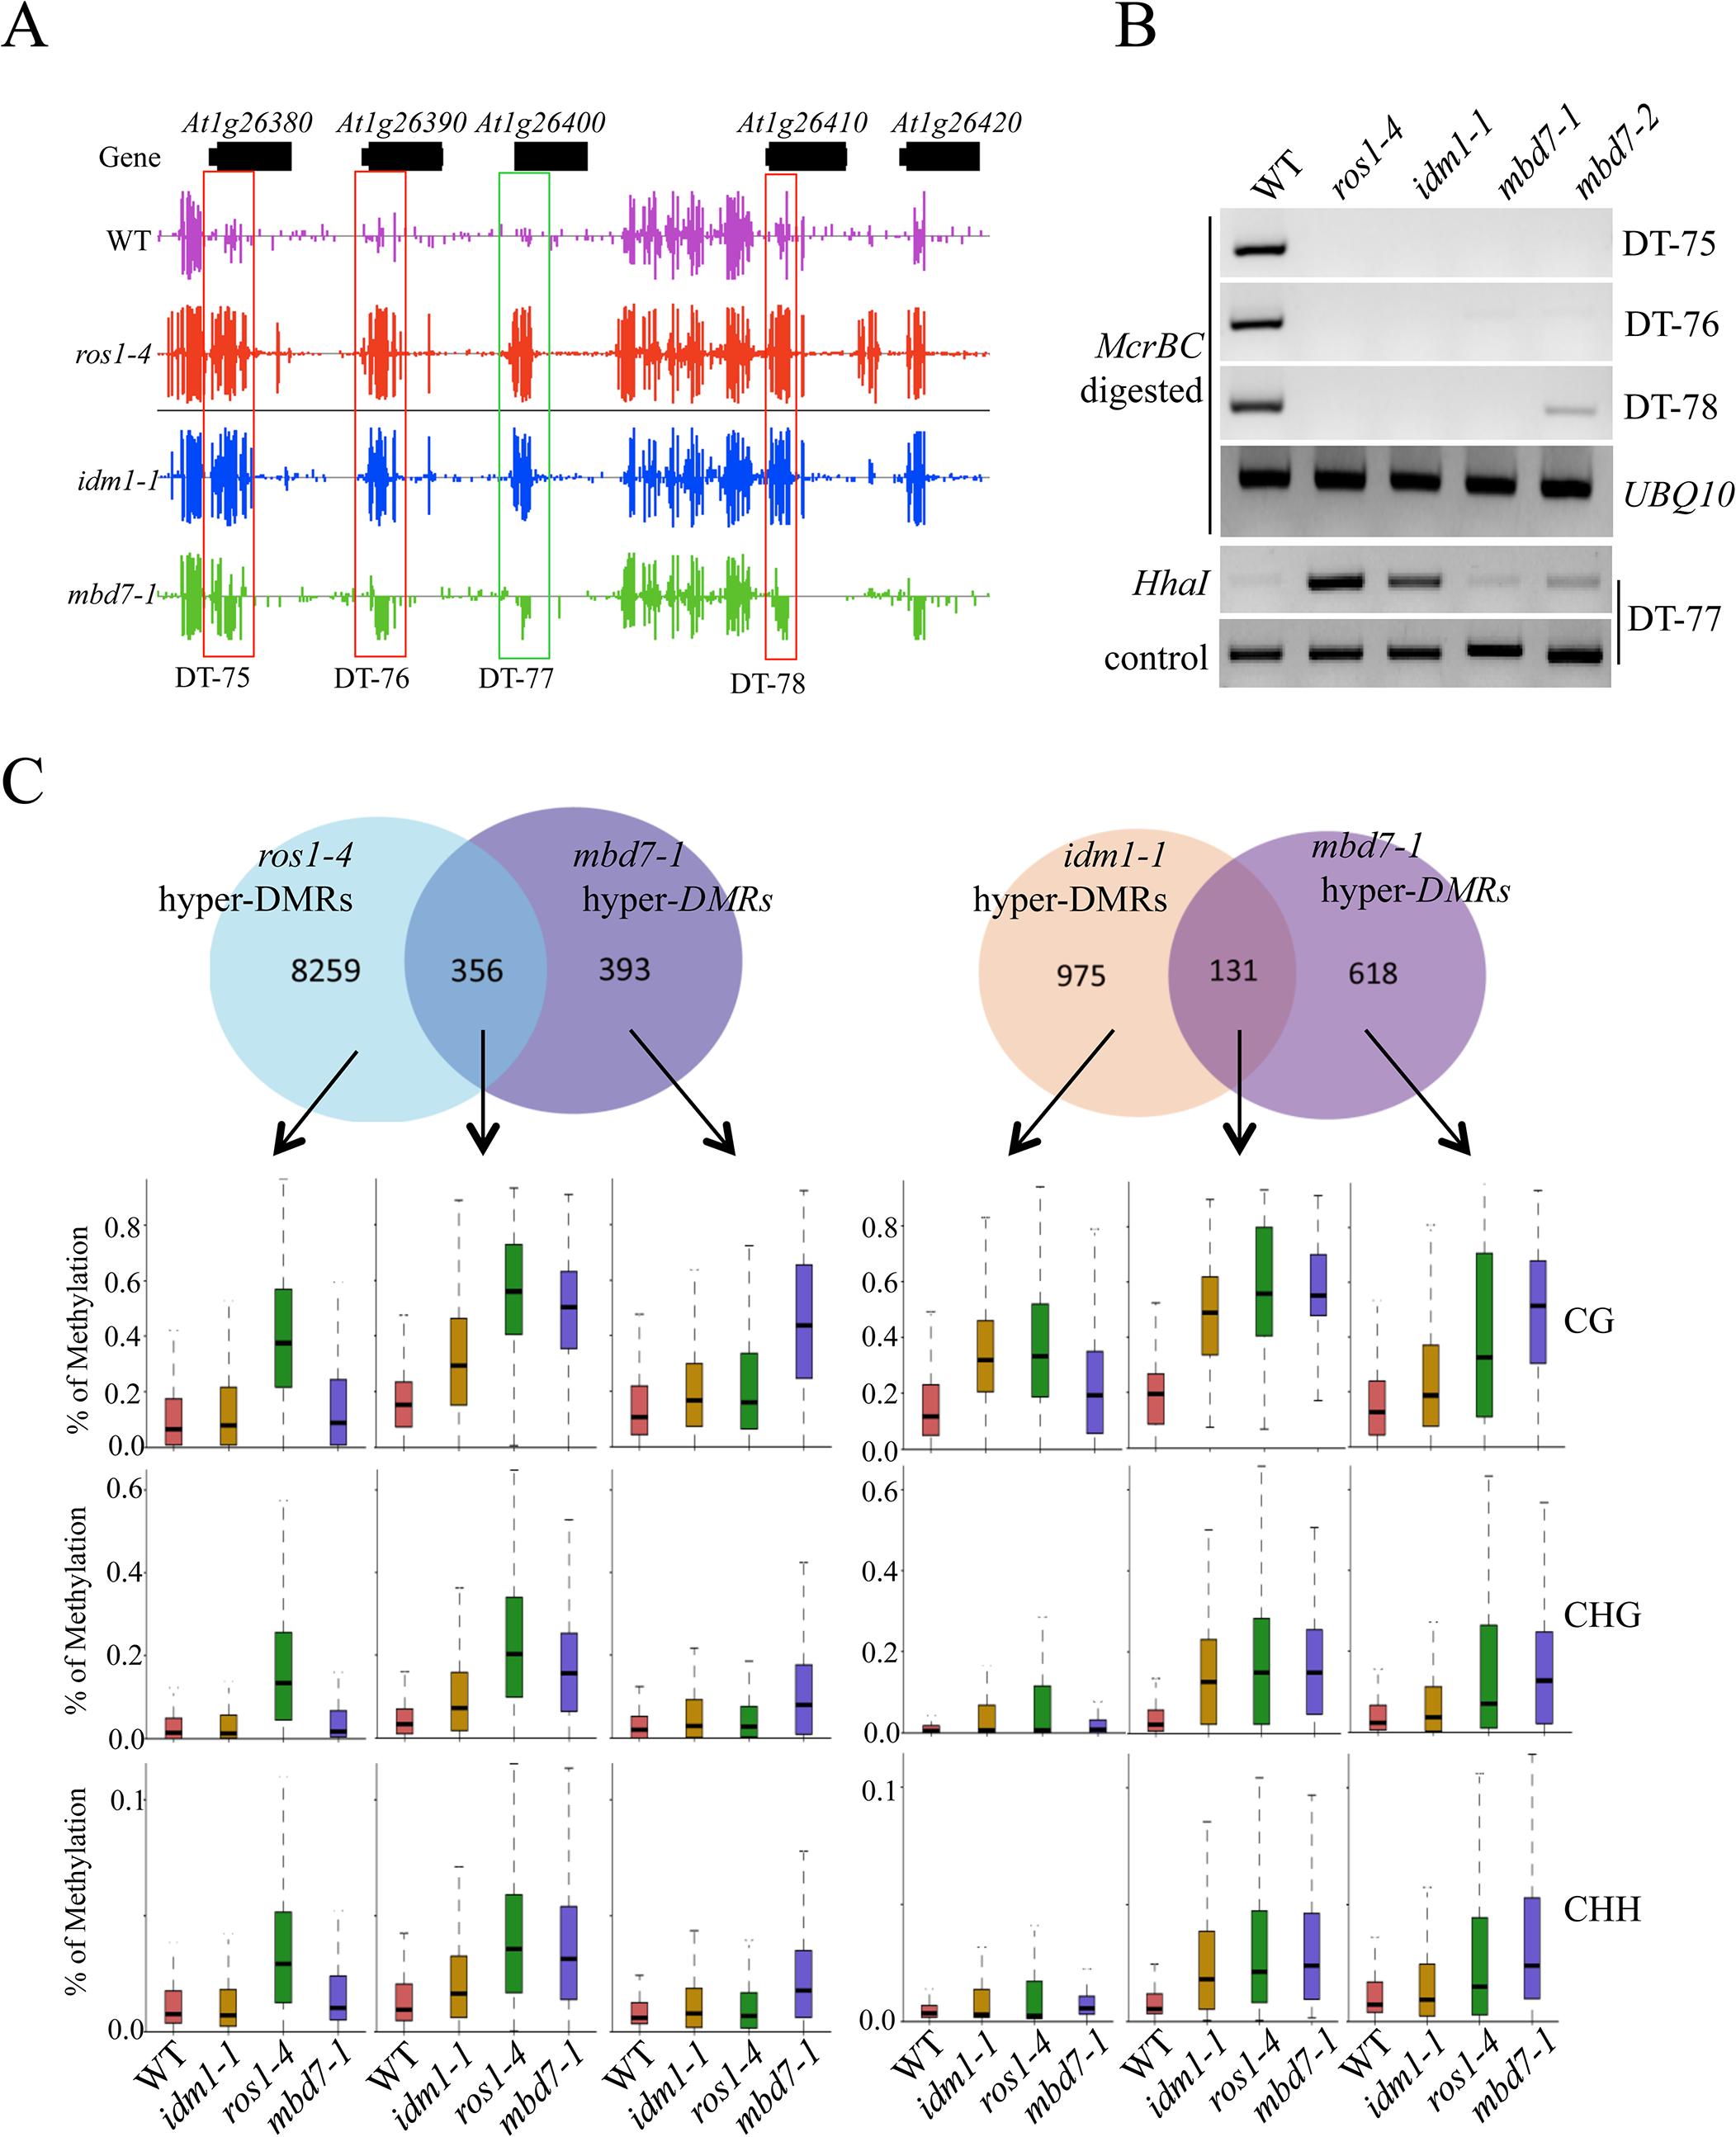 Methylome analysis of <i>mbd7-1</i> mutant.